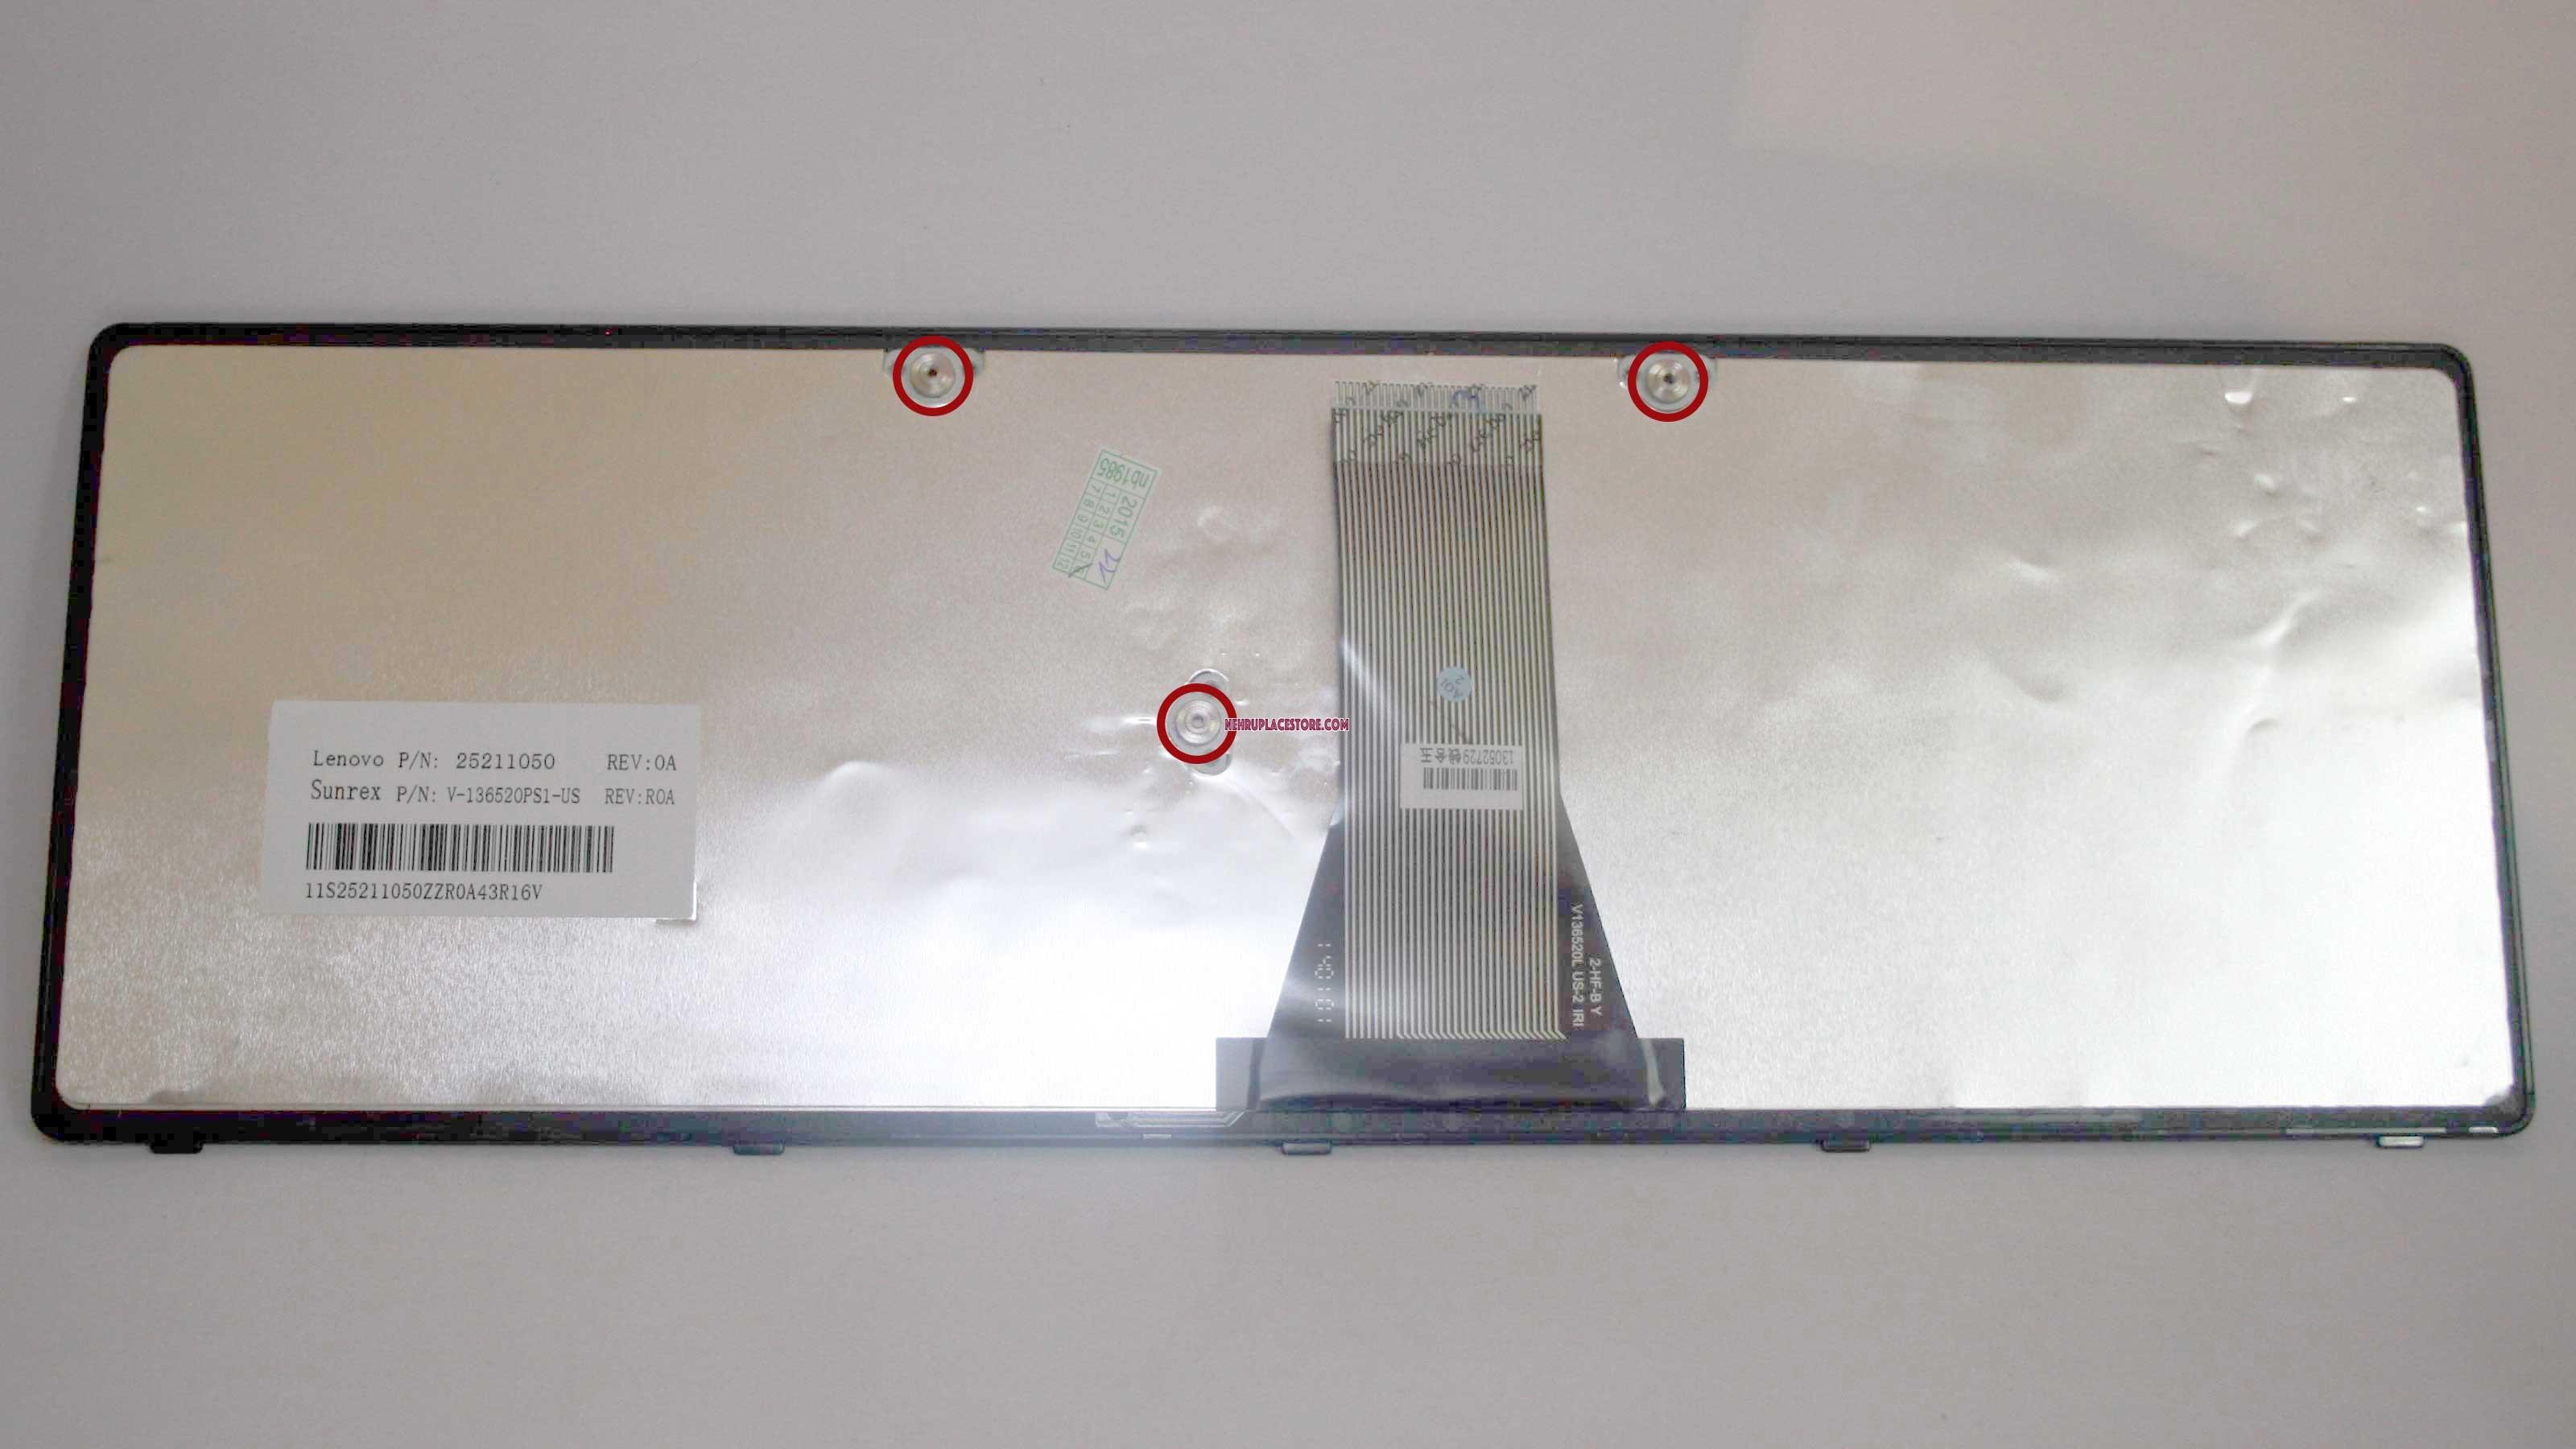 Lenovo g500s bios - 85